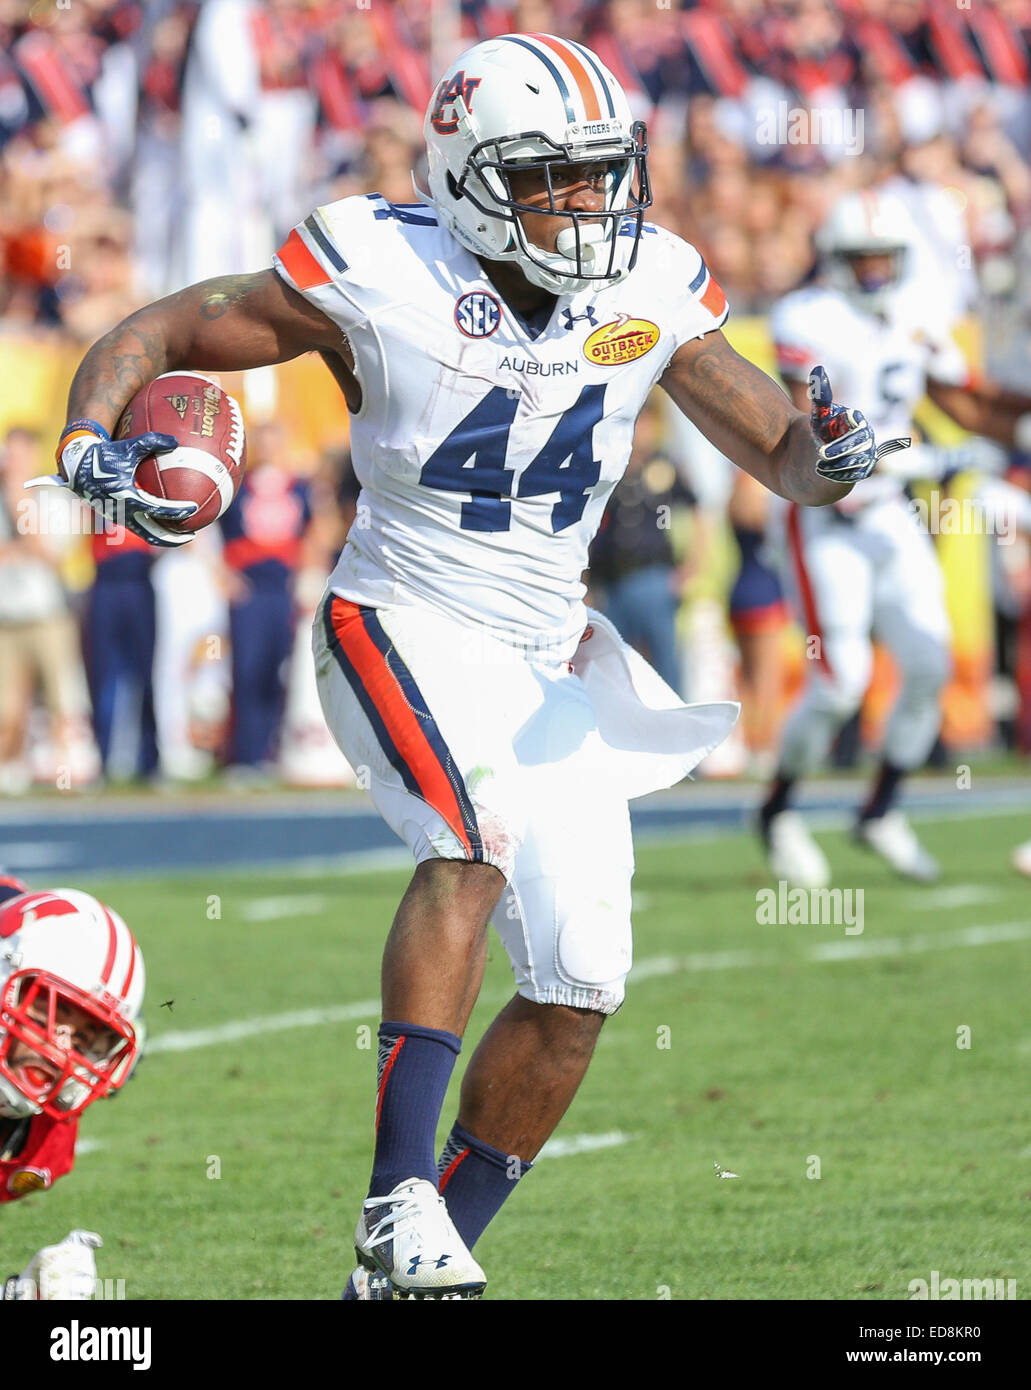 Cameron Artis-Payne Auburn Tigers Football Jersey - Navy